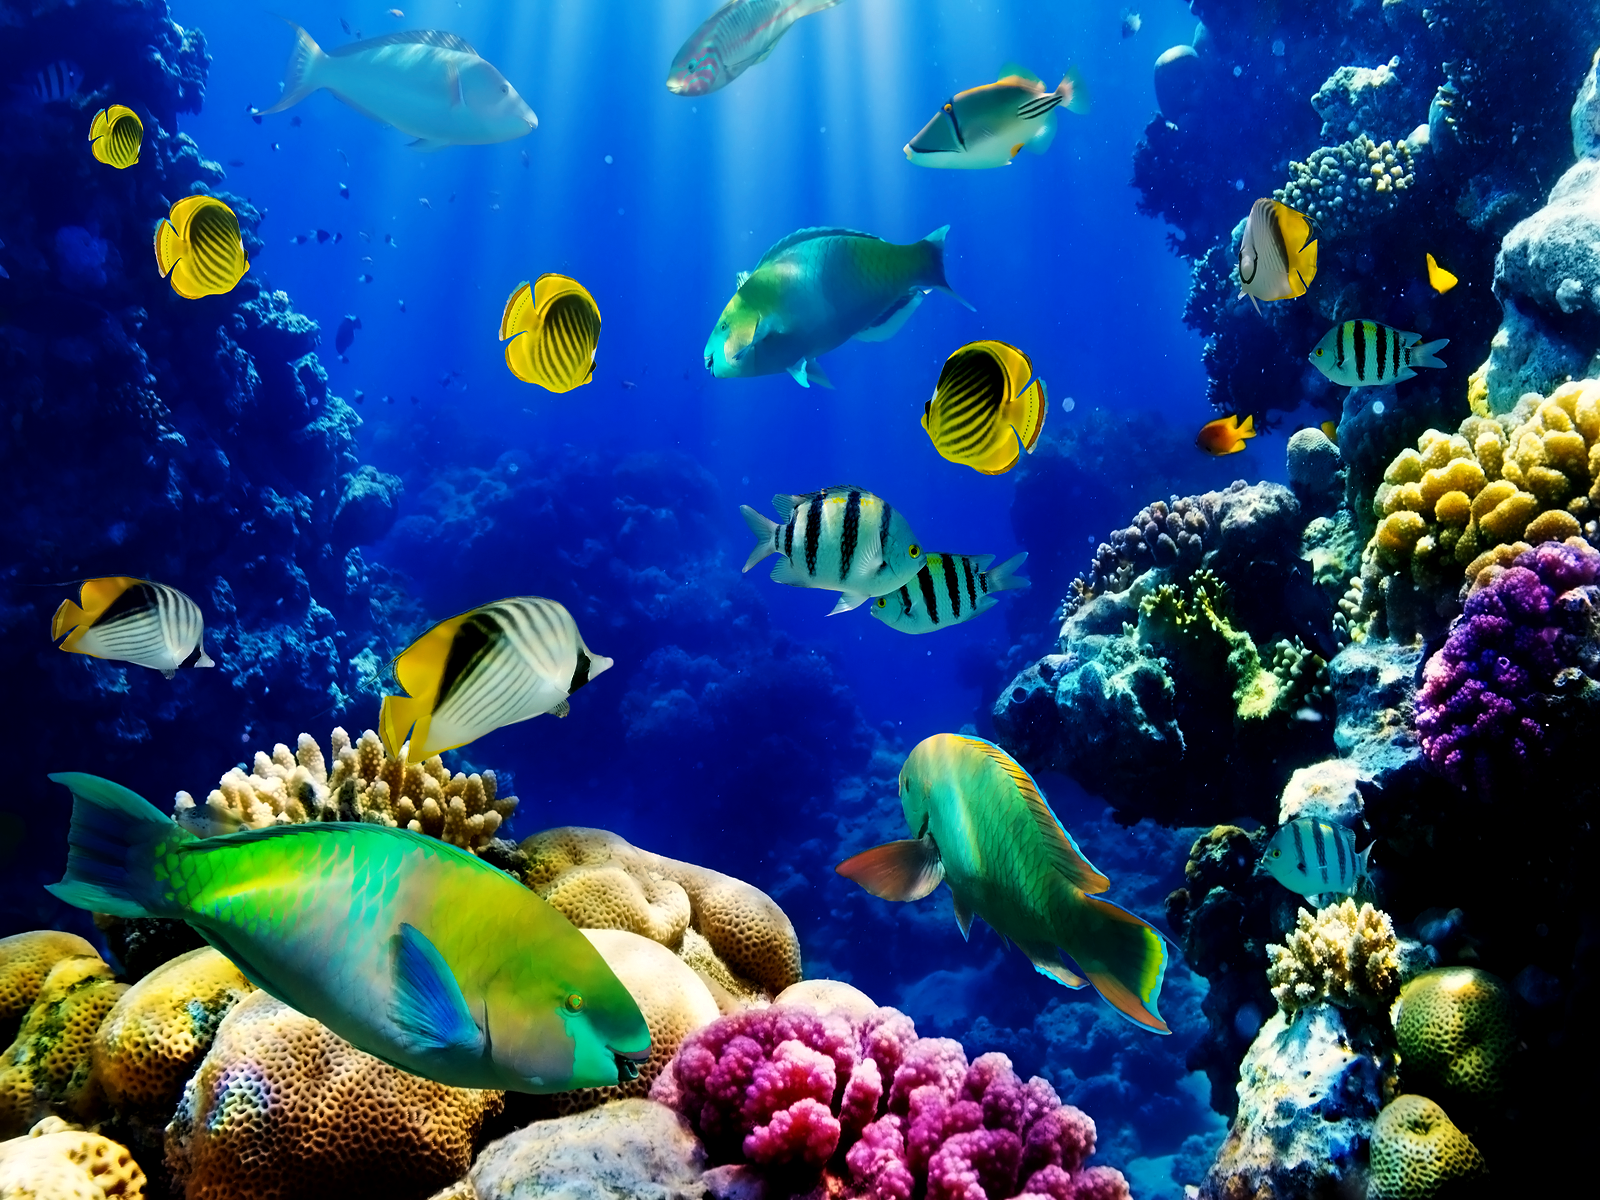 Aquarium Live Wallpaper Windows 8 WallpaperSafari